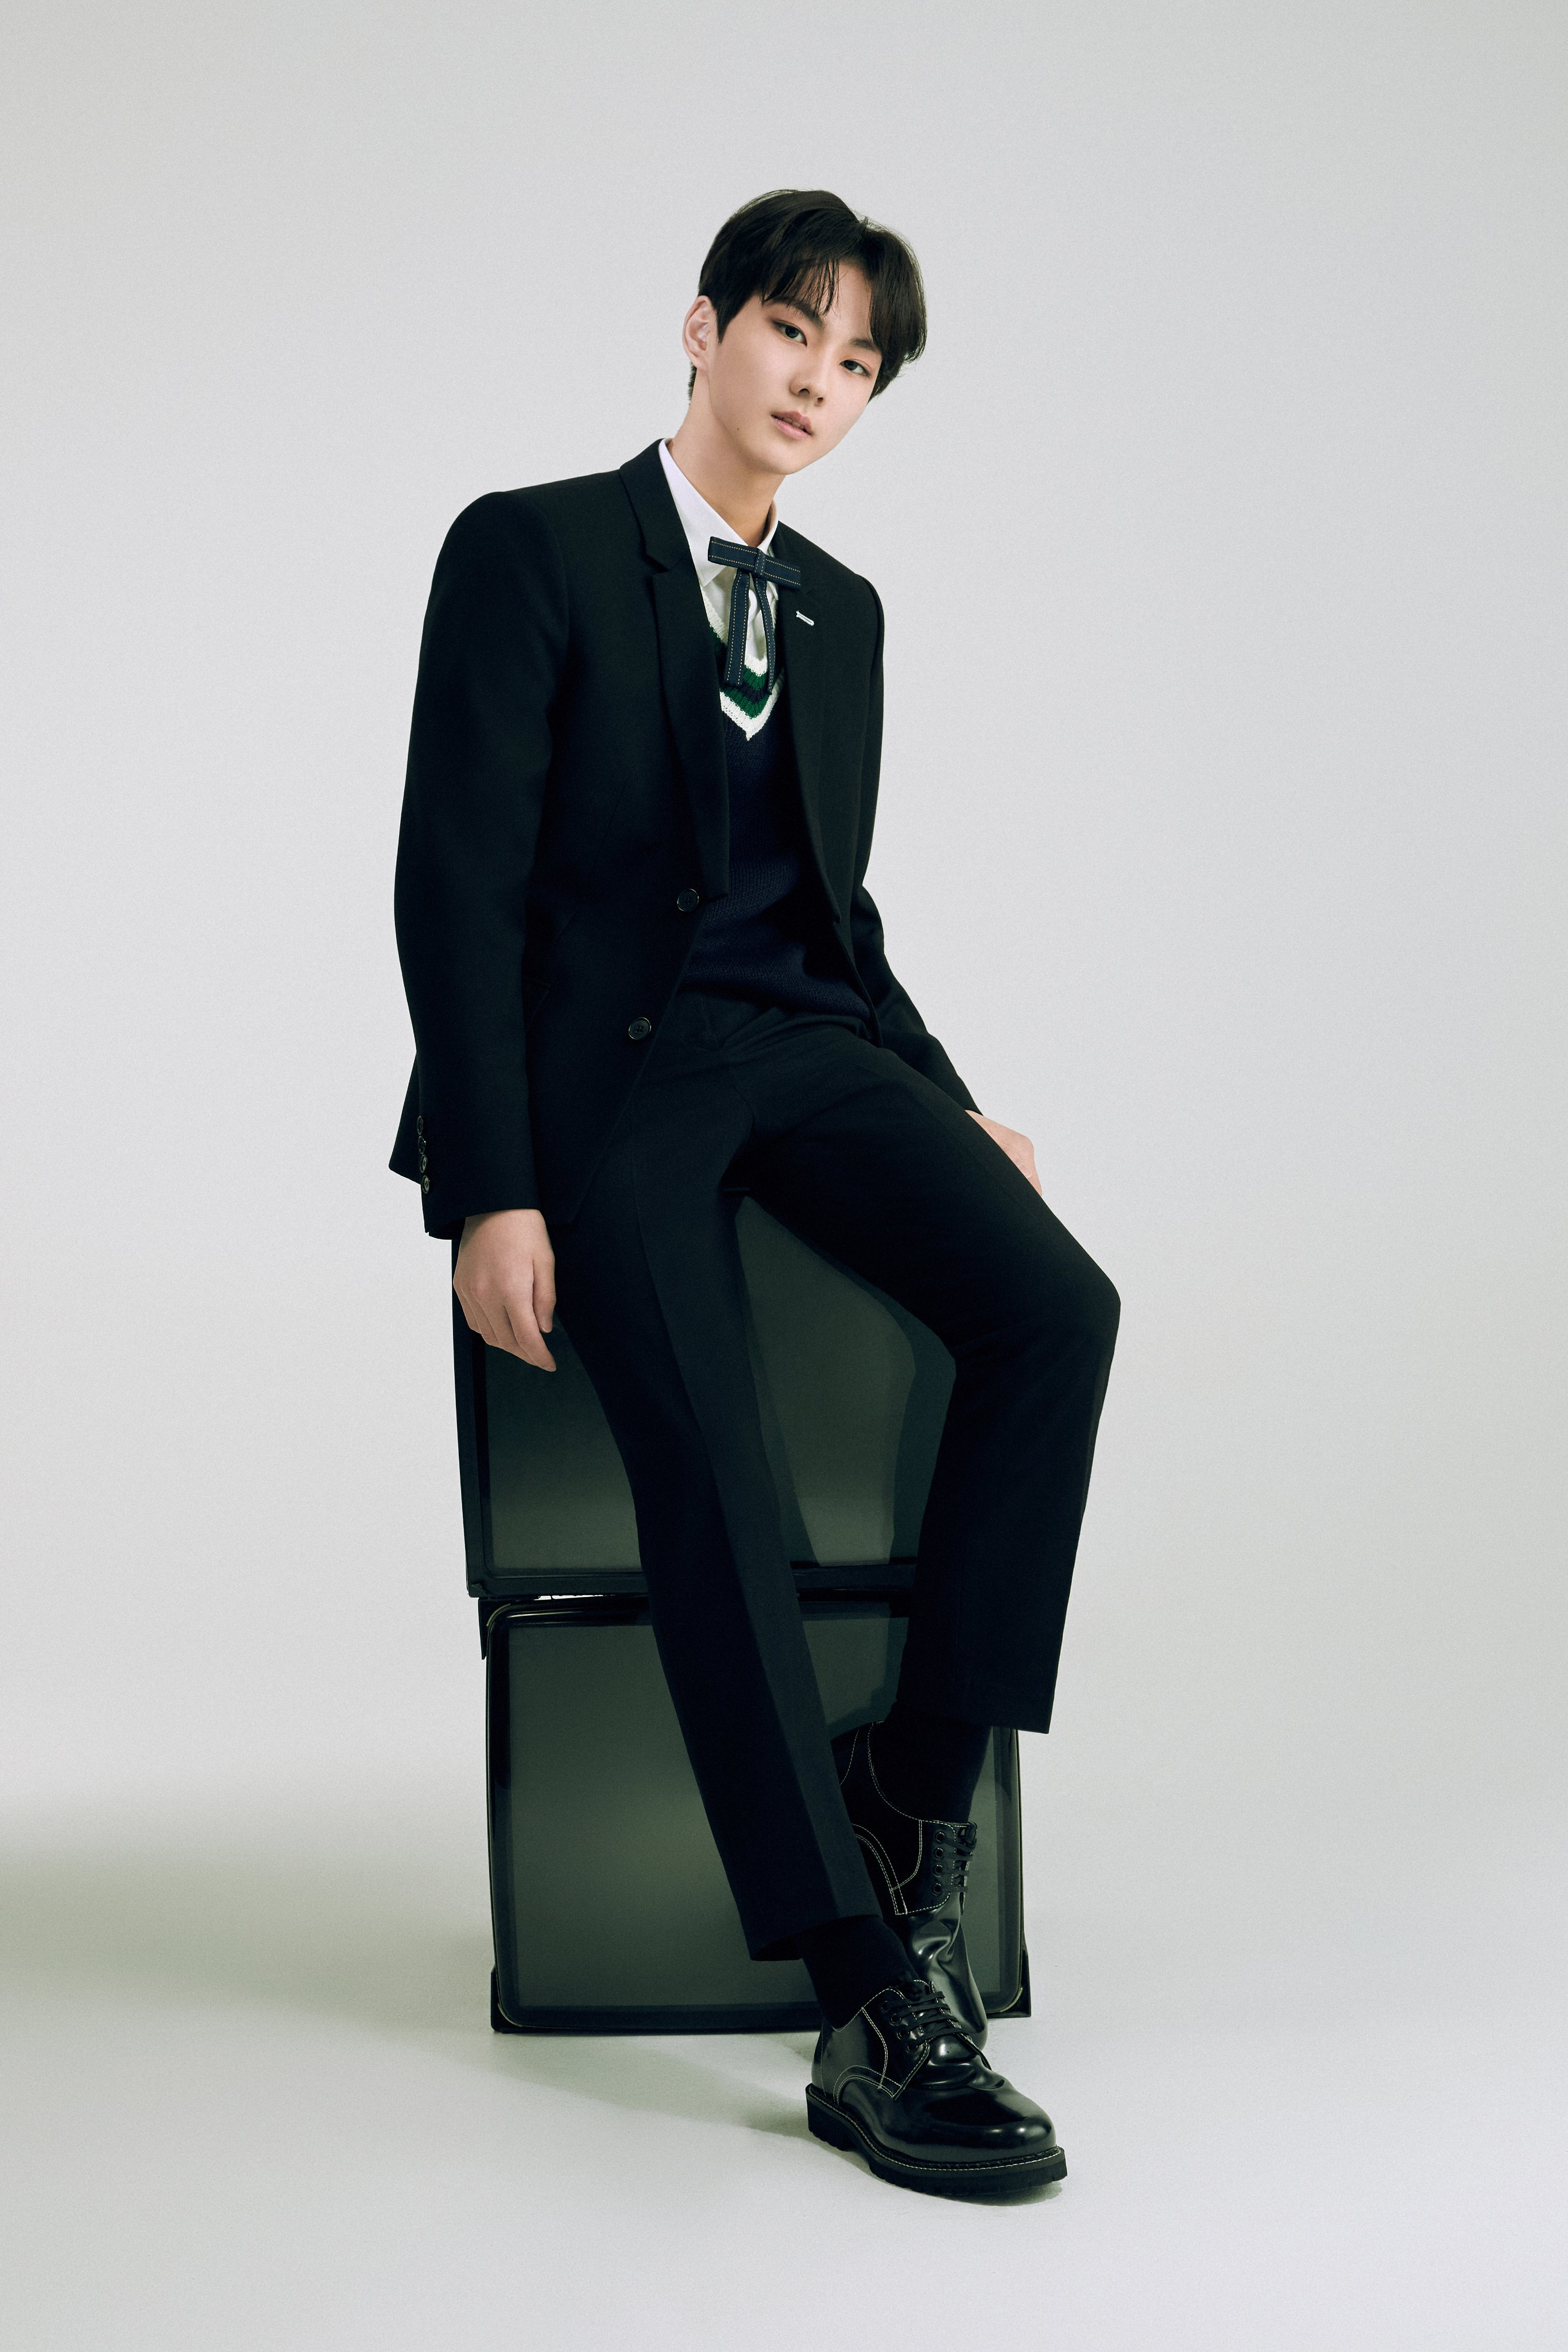 ENHYPEN Official Profile Jungwoo   ENHYPEN Photo 43587561 2731x4096